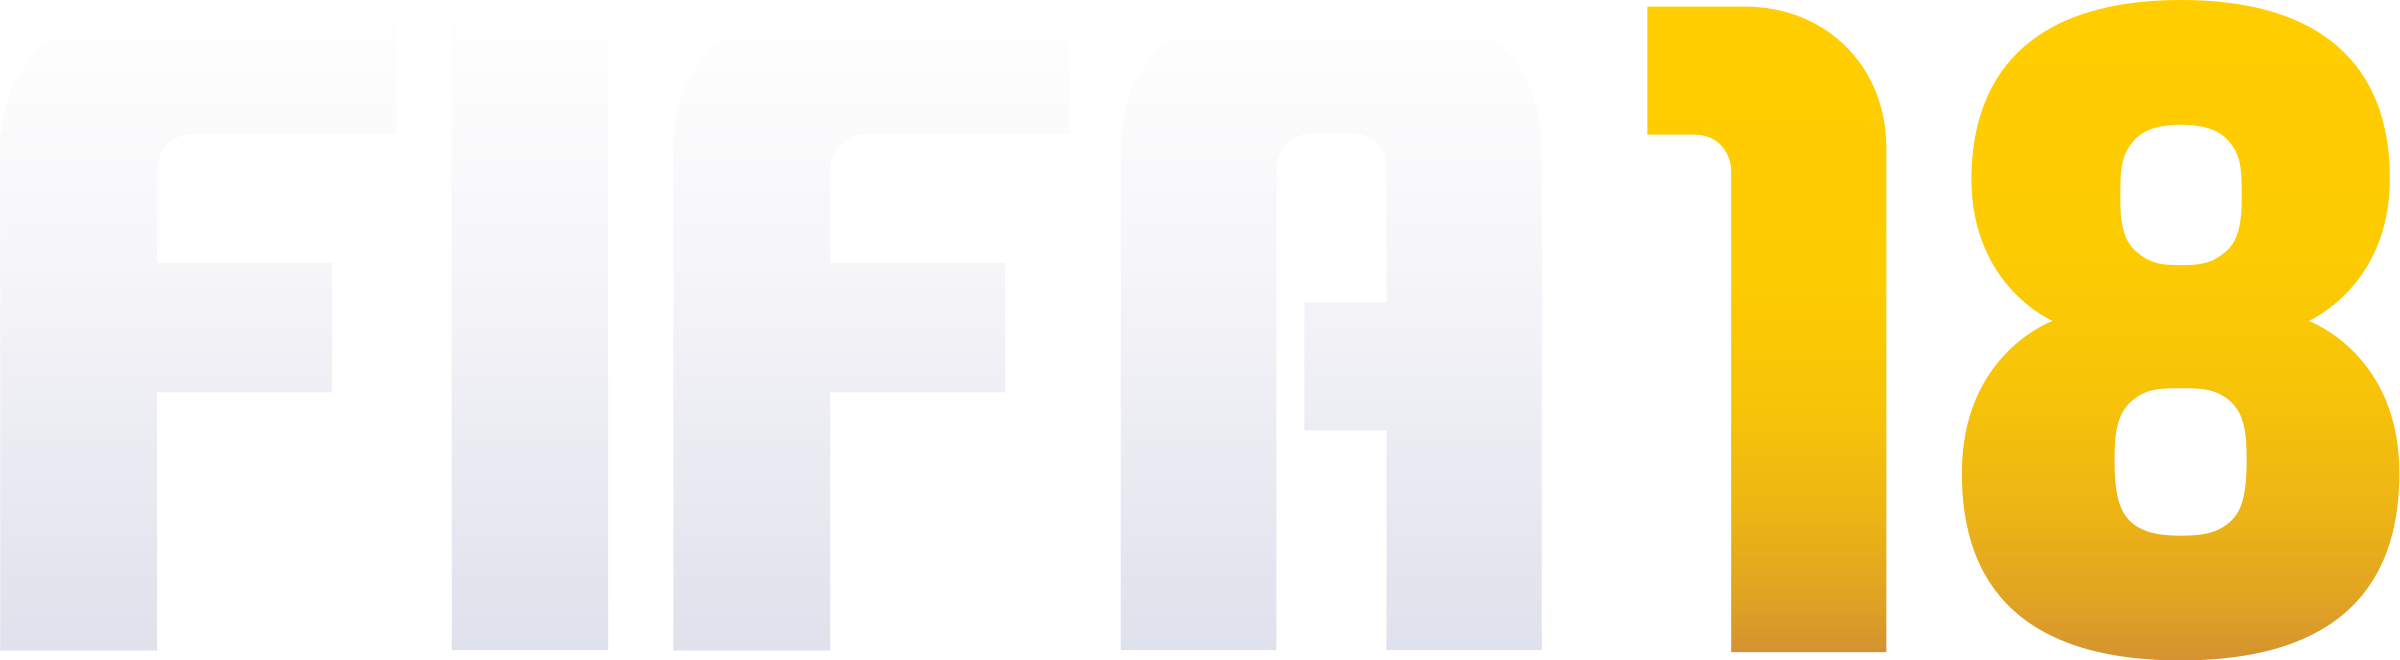 Fifa 18 Logo Png Transparent